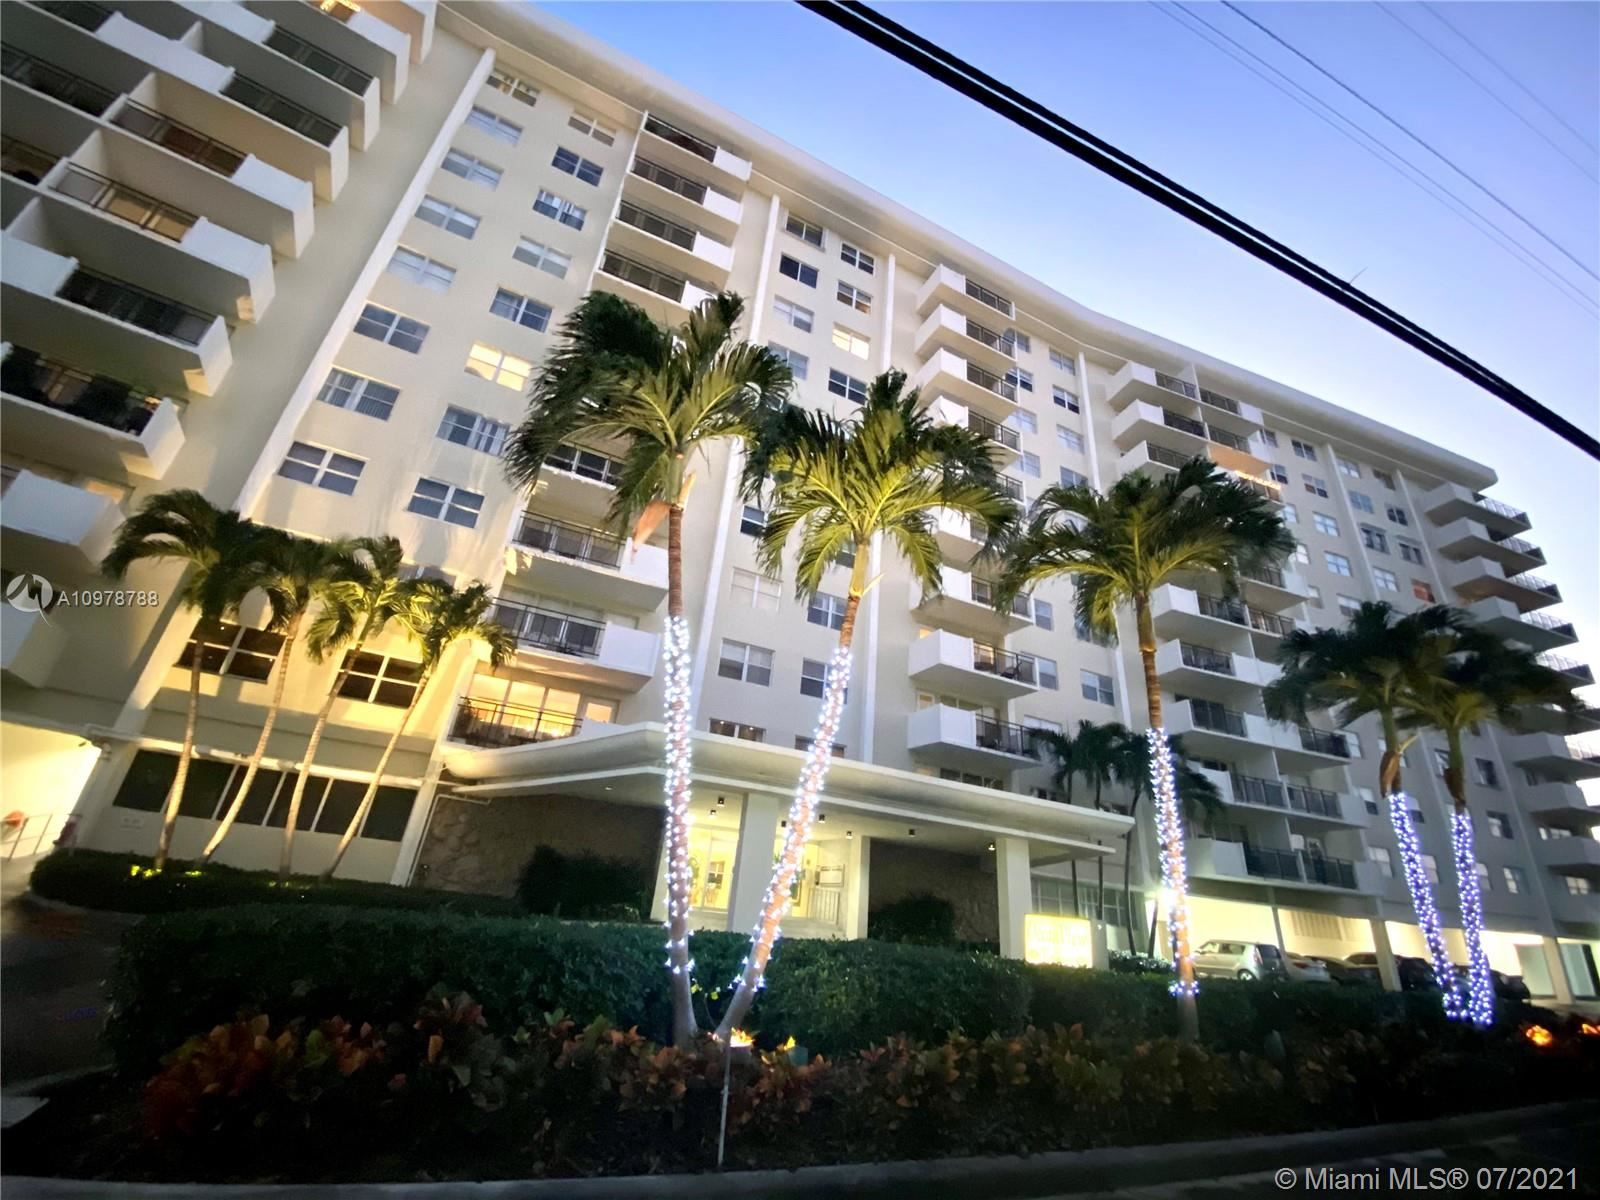 401 Golden Isles Dr #413, Hallandale Beach, FL 33009 - #: A10978788